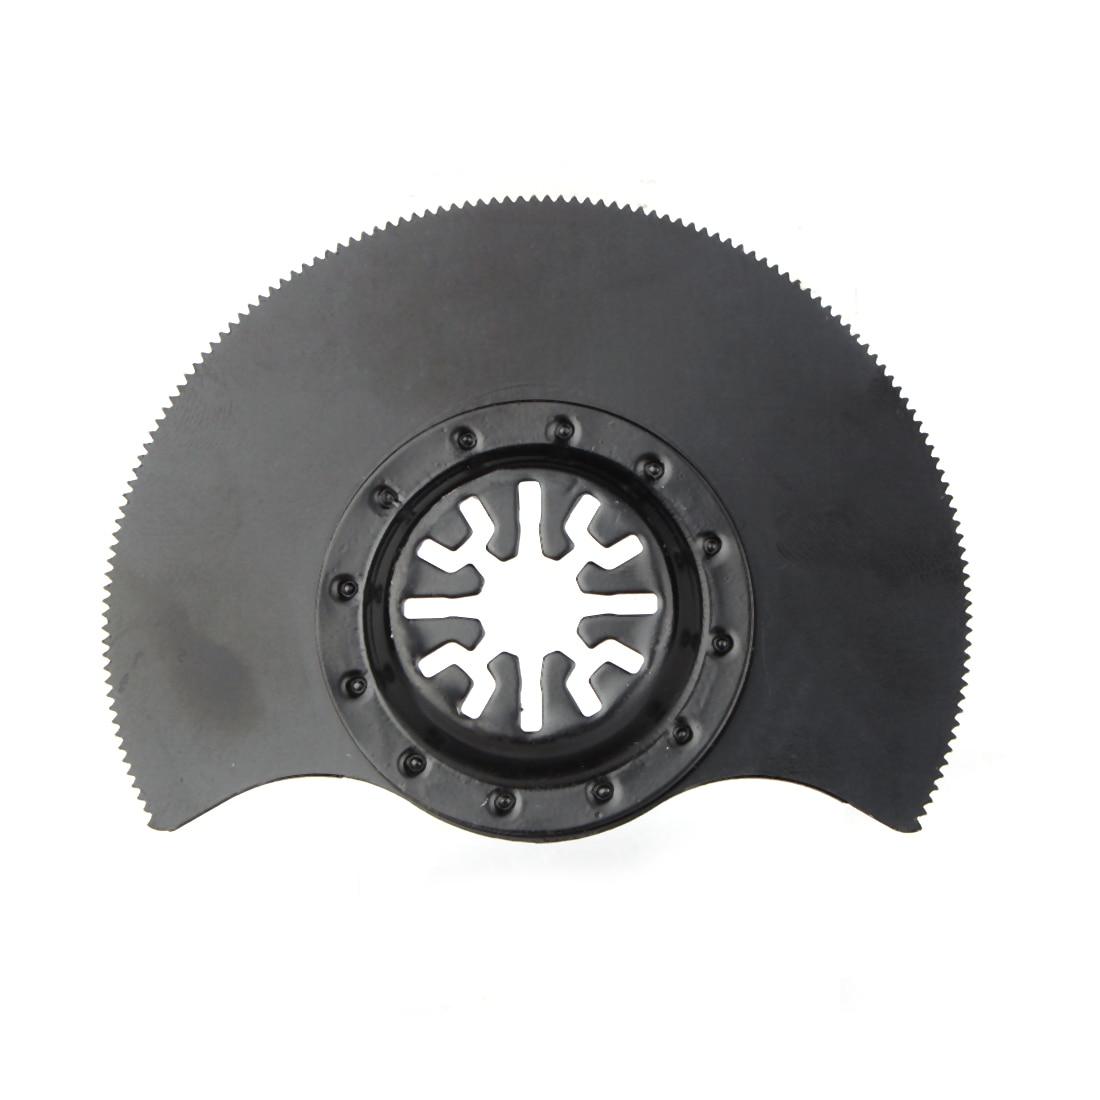 Semi-circular Oscillating Saw Blade HCS For Multimaster Fein Makita Decker Wood Cutting Tools 88mm